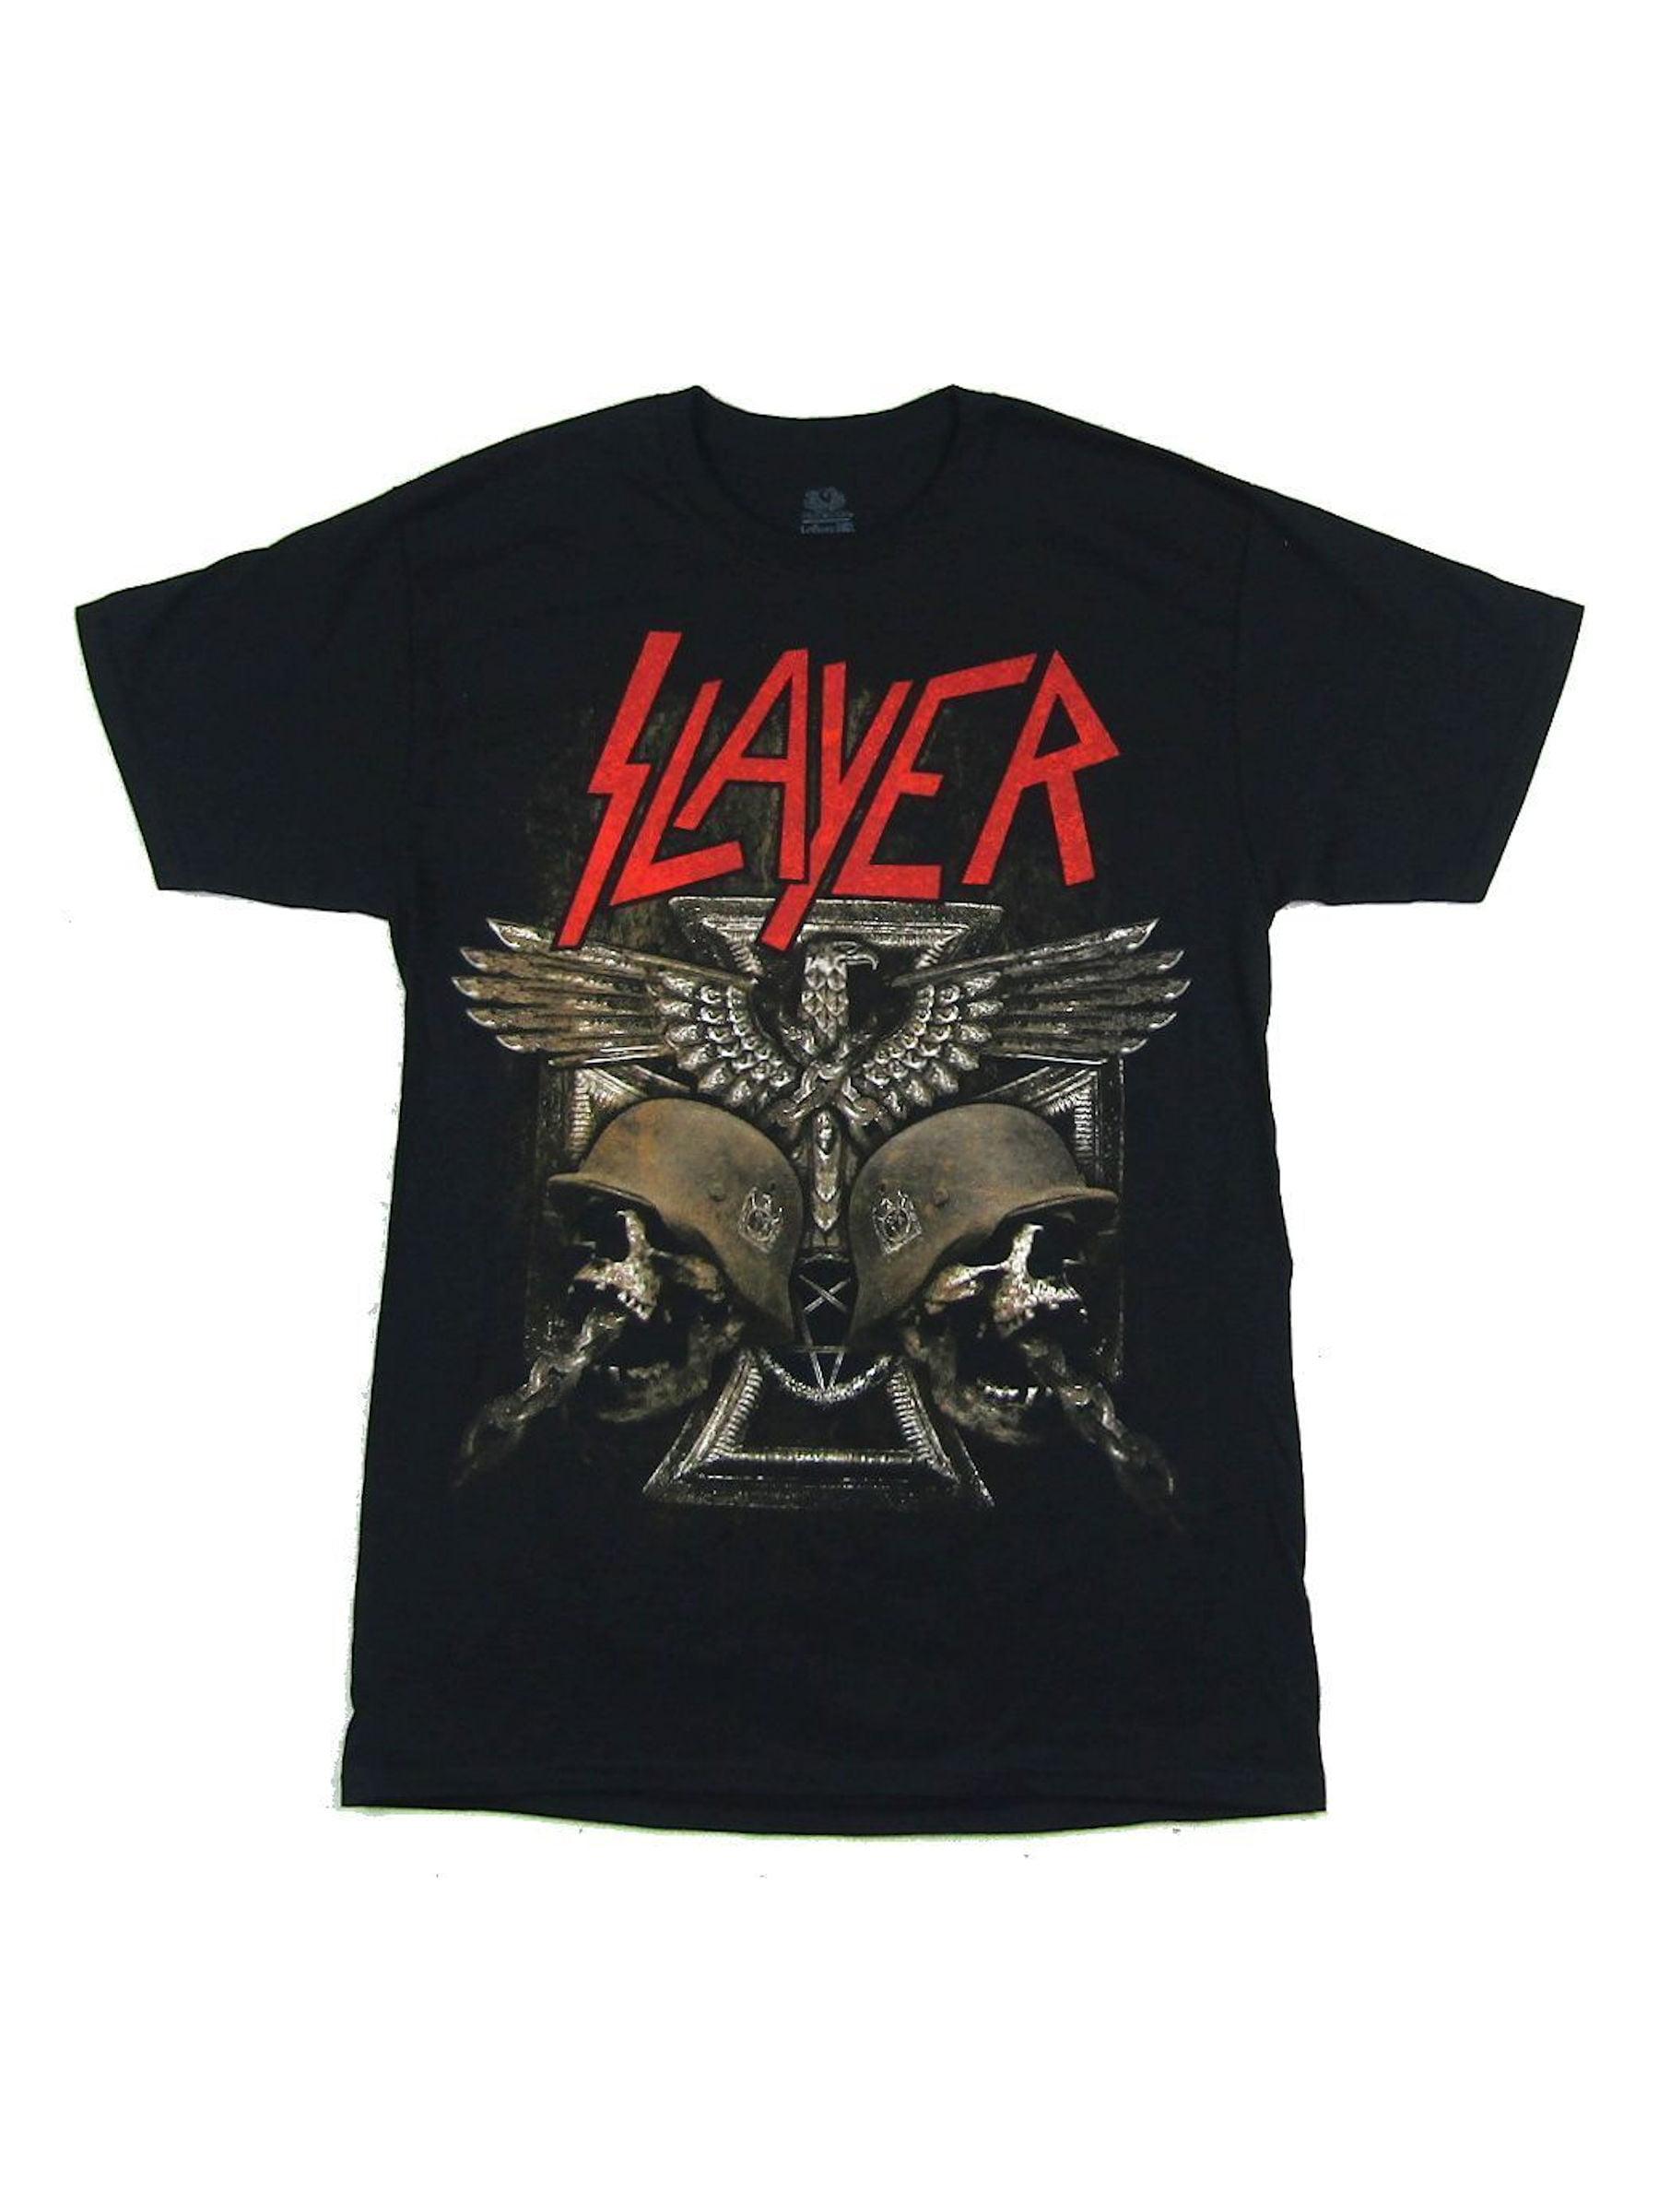 Slayer Arsenal Metal Skull Bullets Black T Shirt New Official Band Merch